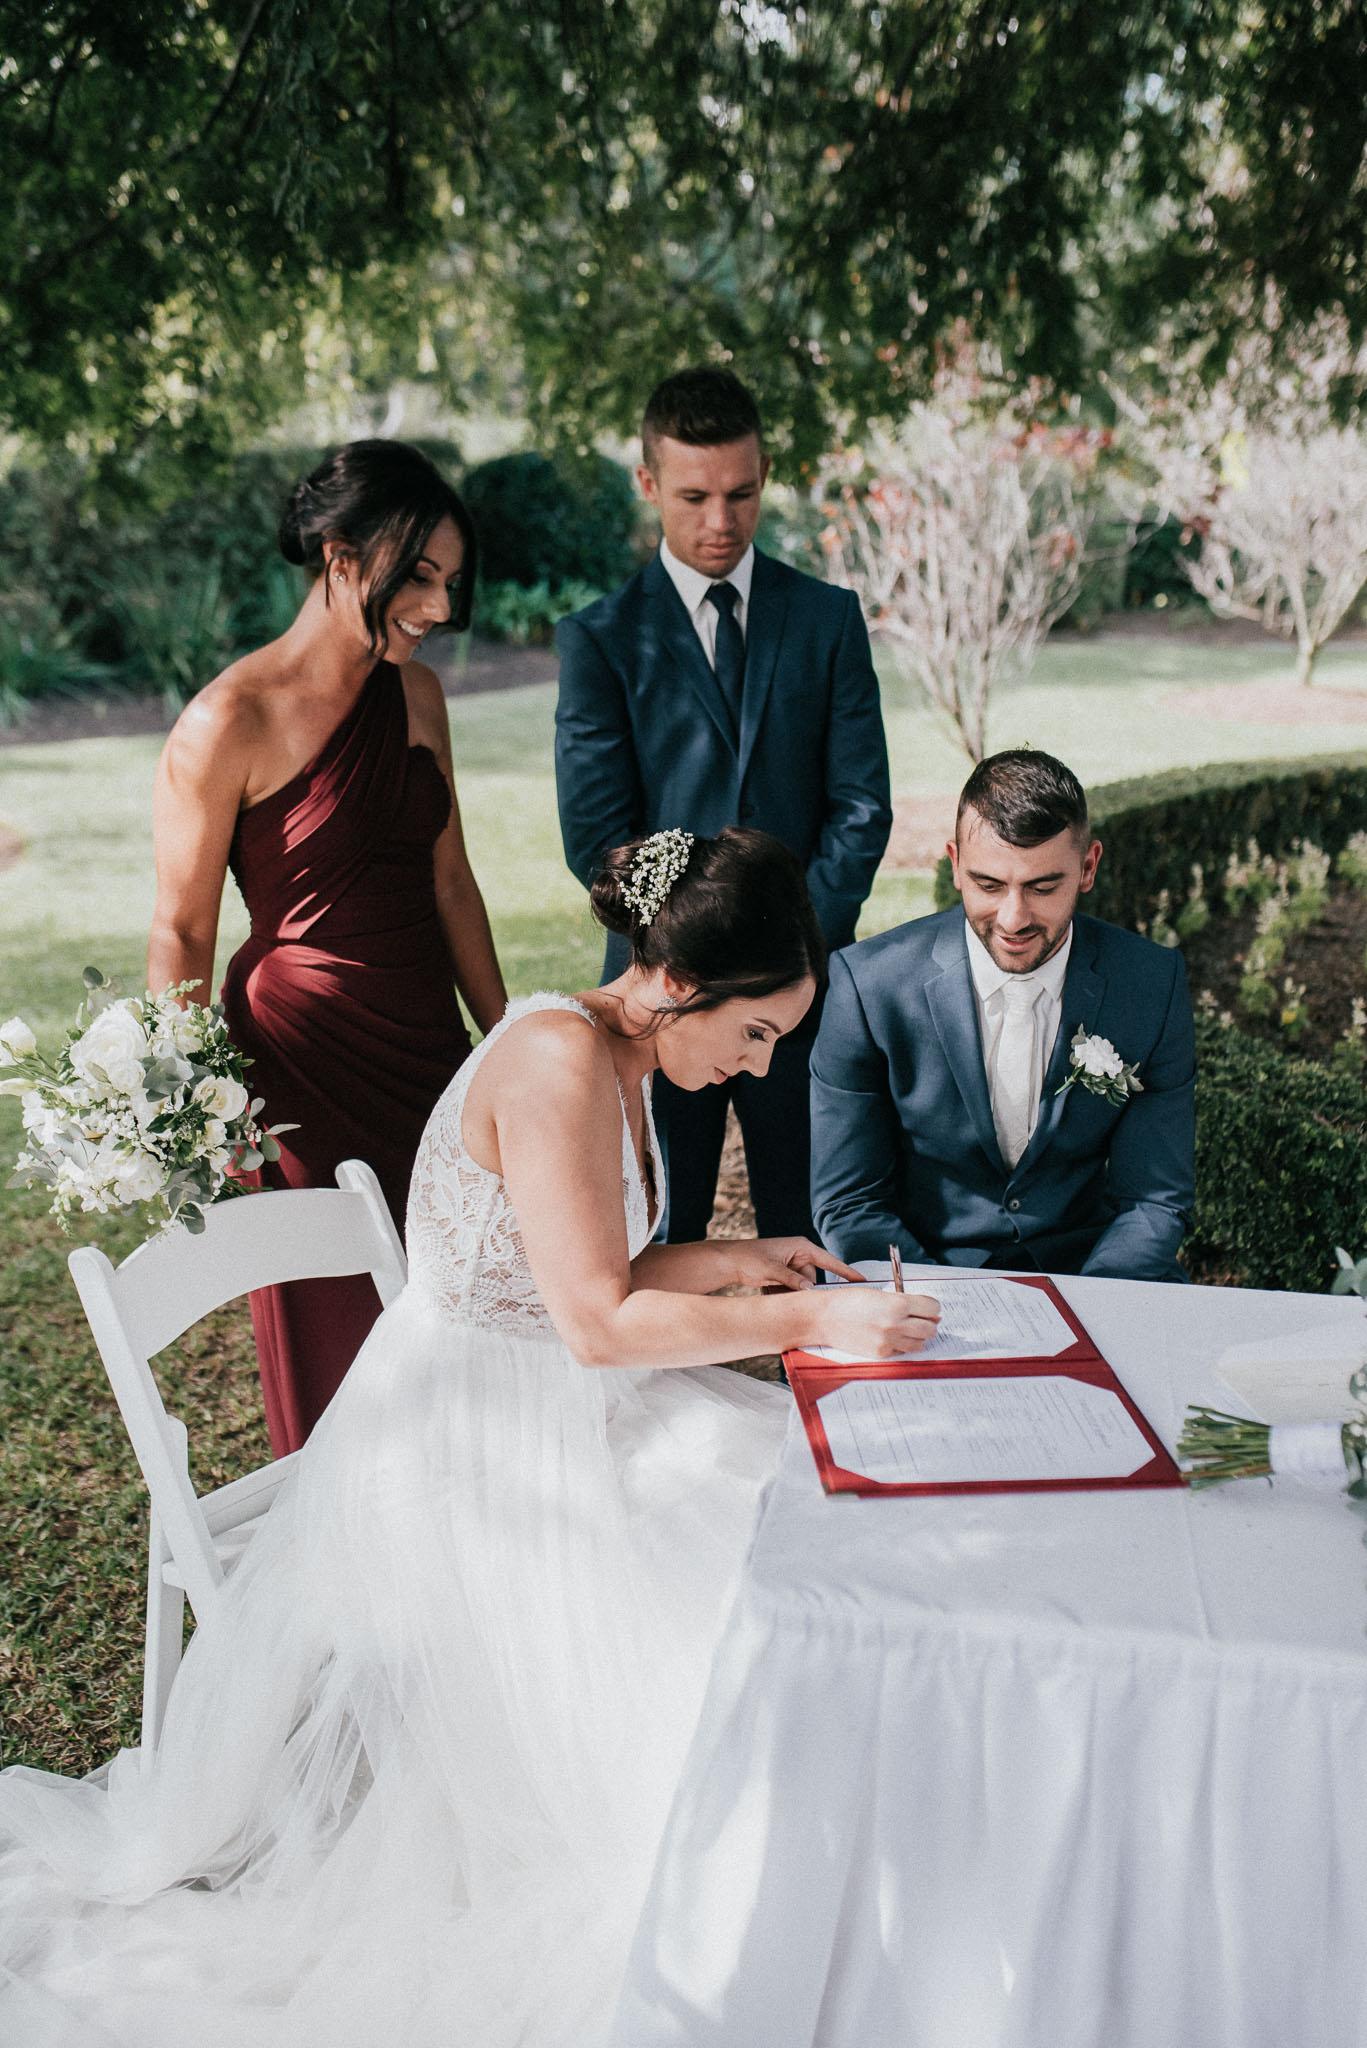 MECURE-RESORT-WEDDING-KING-WEB-80.jpg